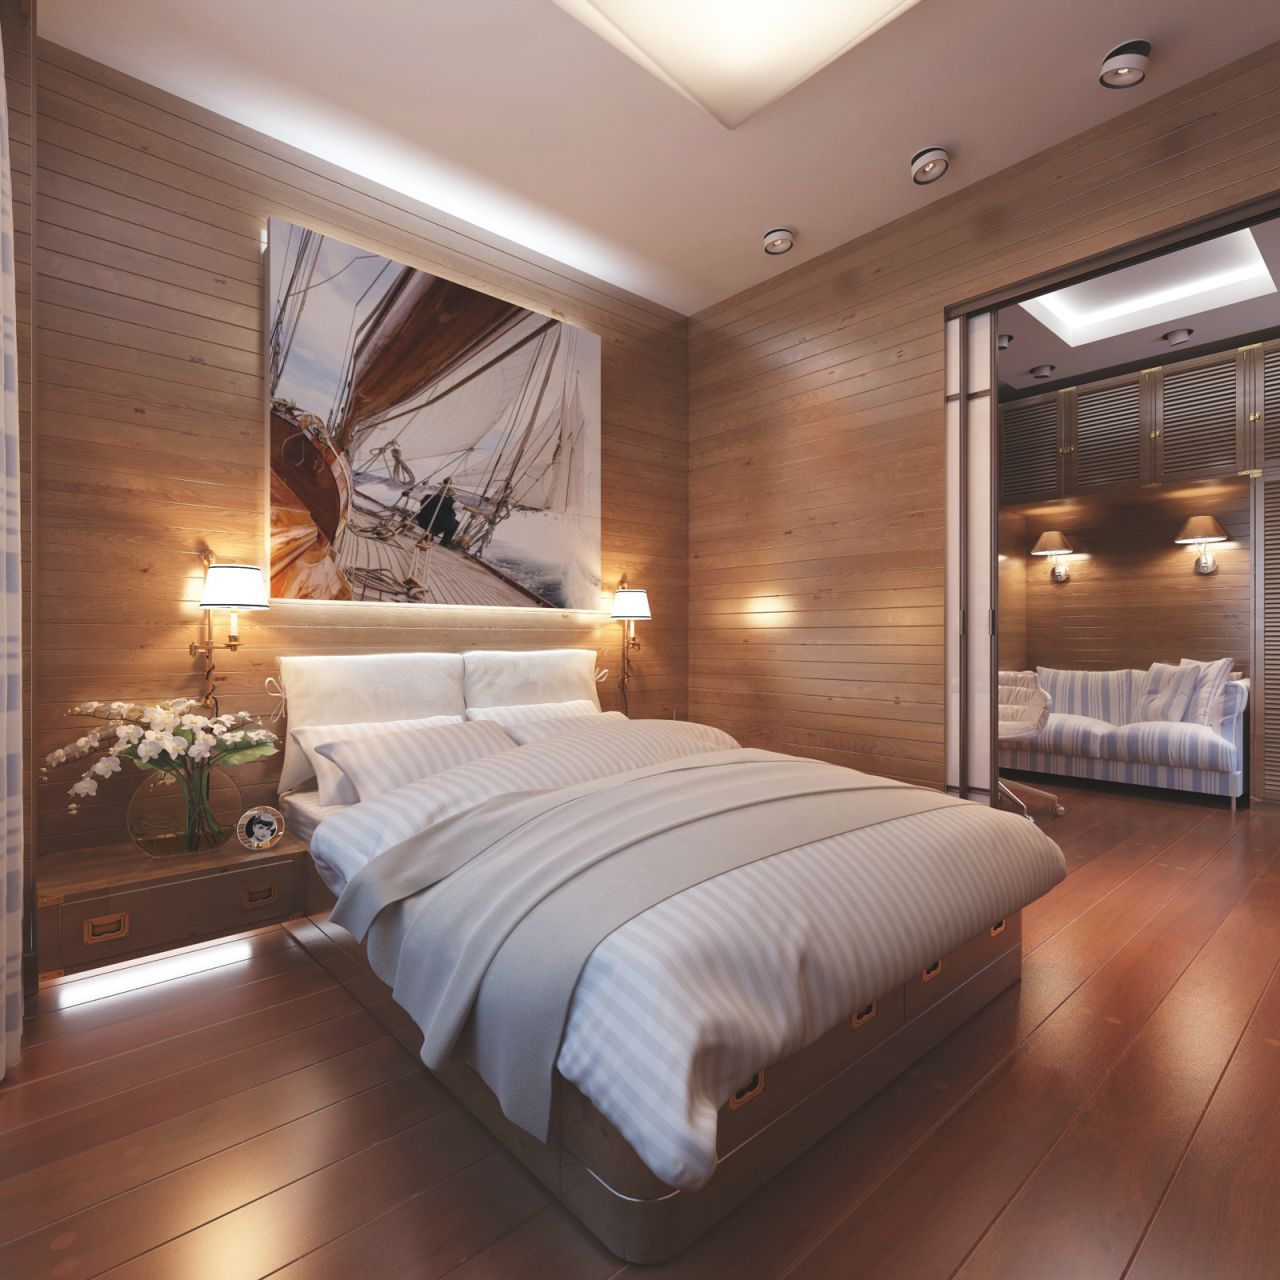 Bedroom Design: Cabin Style Bedroom Decor, Modern Bedroom within Cabin Bedroom Decorating Ideas